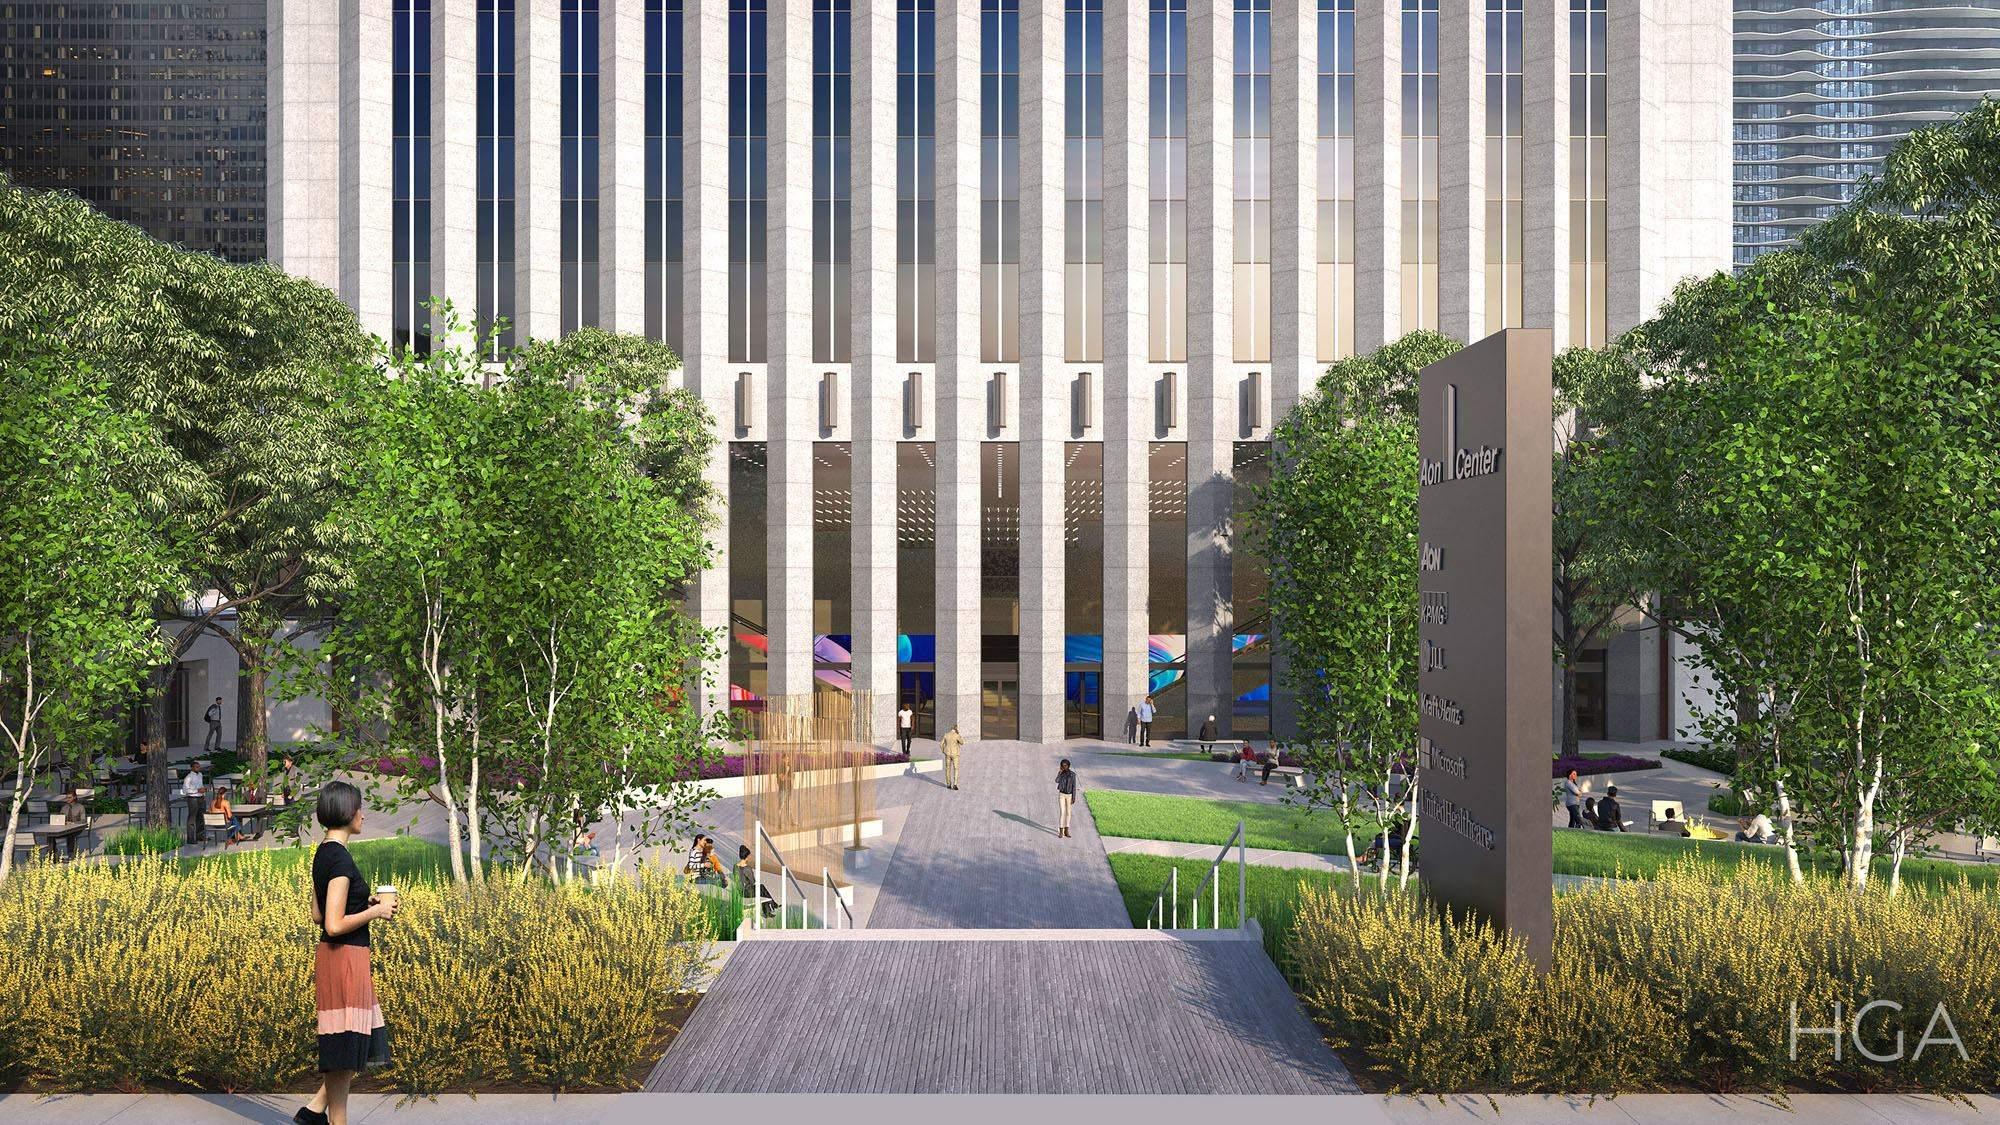 Aon Center Plaza renovation